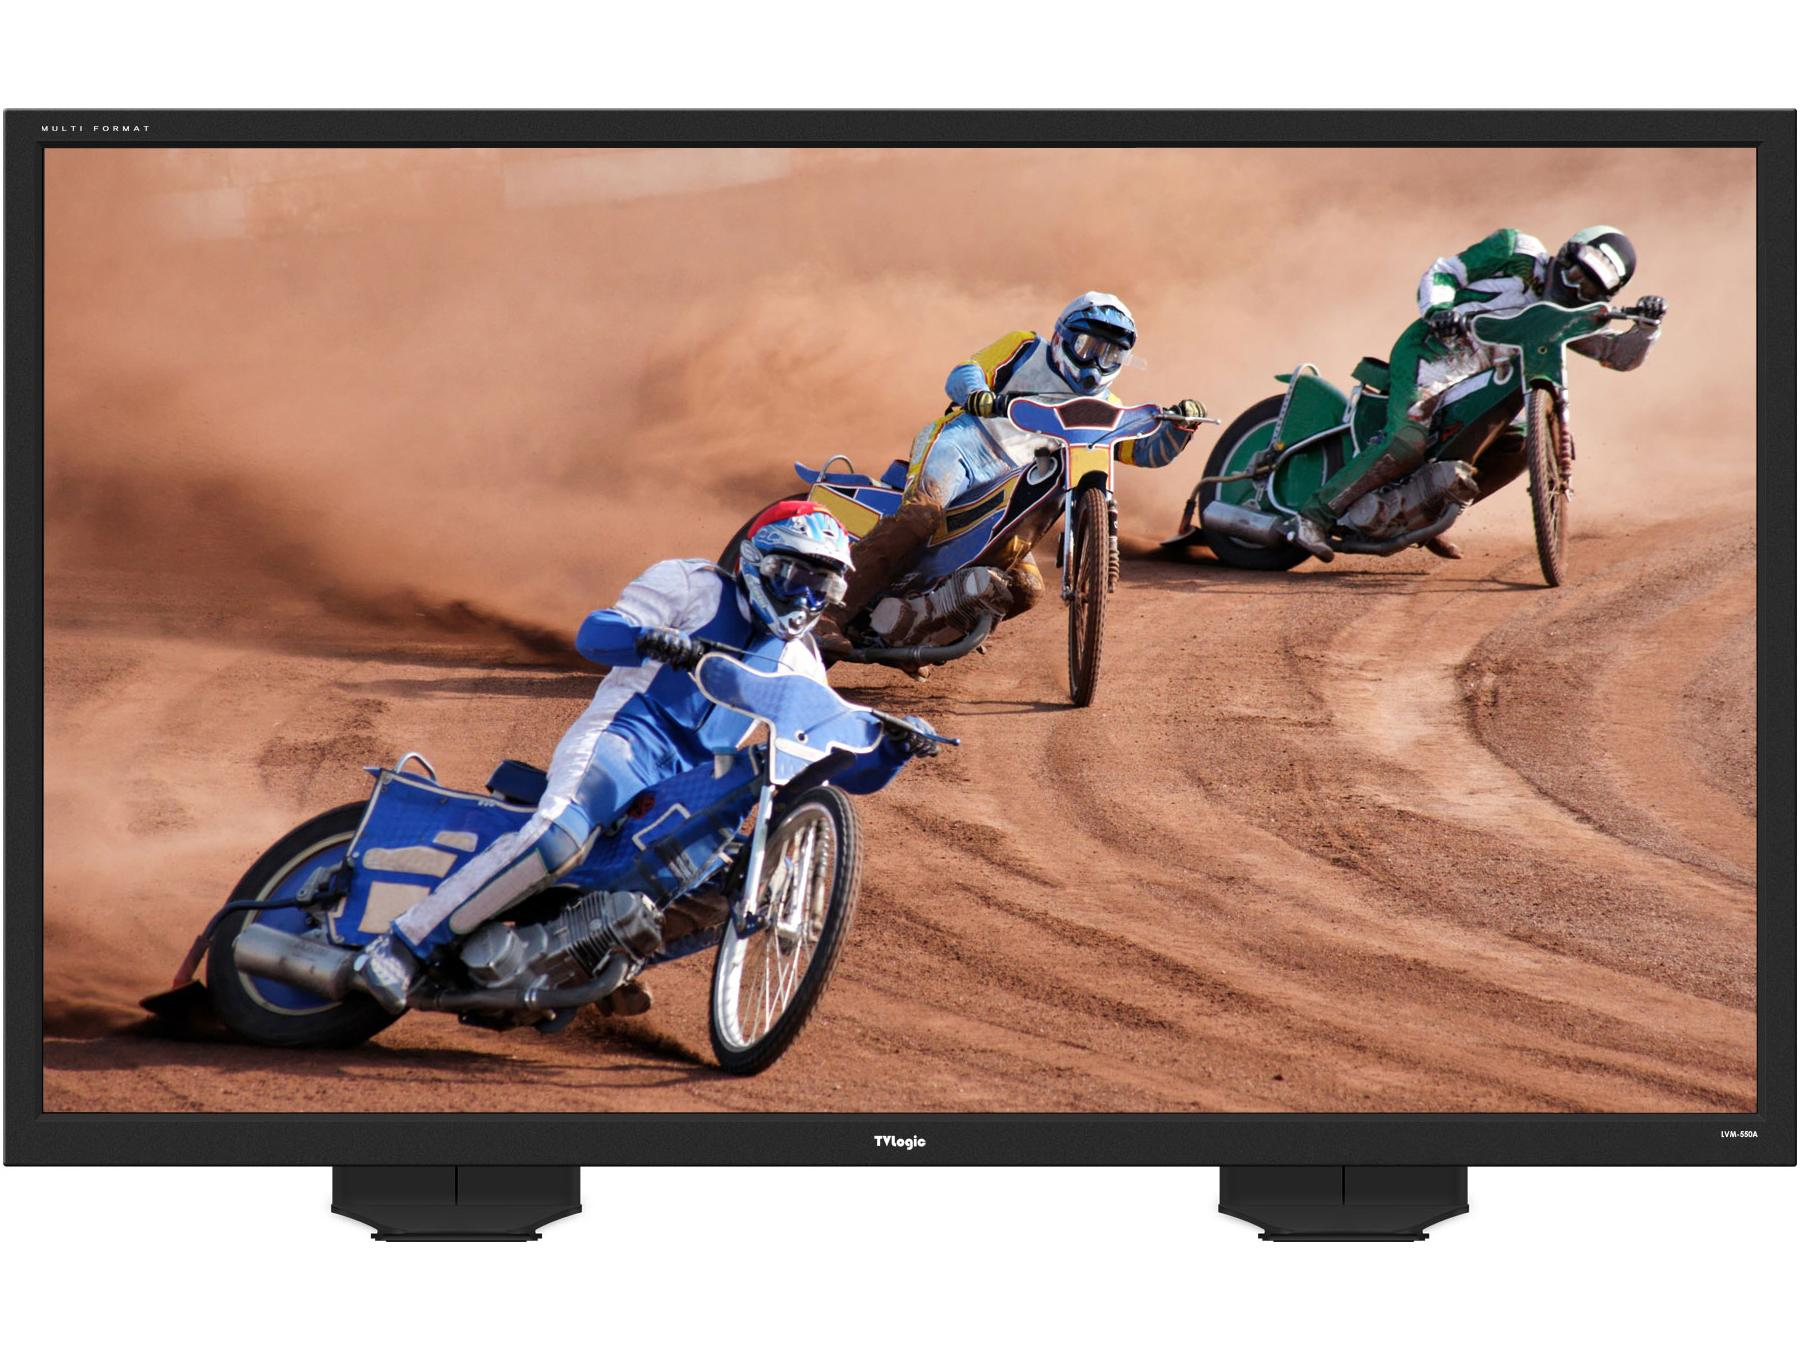 TVlogic LVM-550A 55 inch Analog/SDI/DVI/HDMI Native HD 1920x1080 QC-Grade LCD Monitor